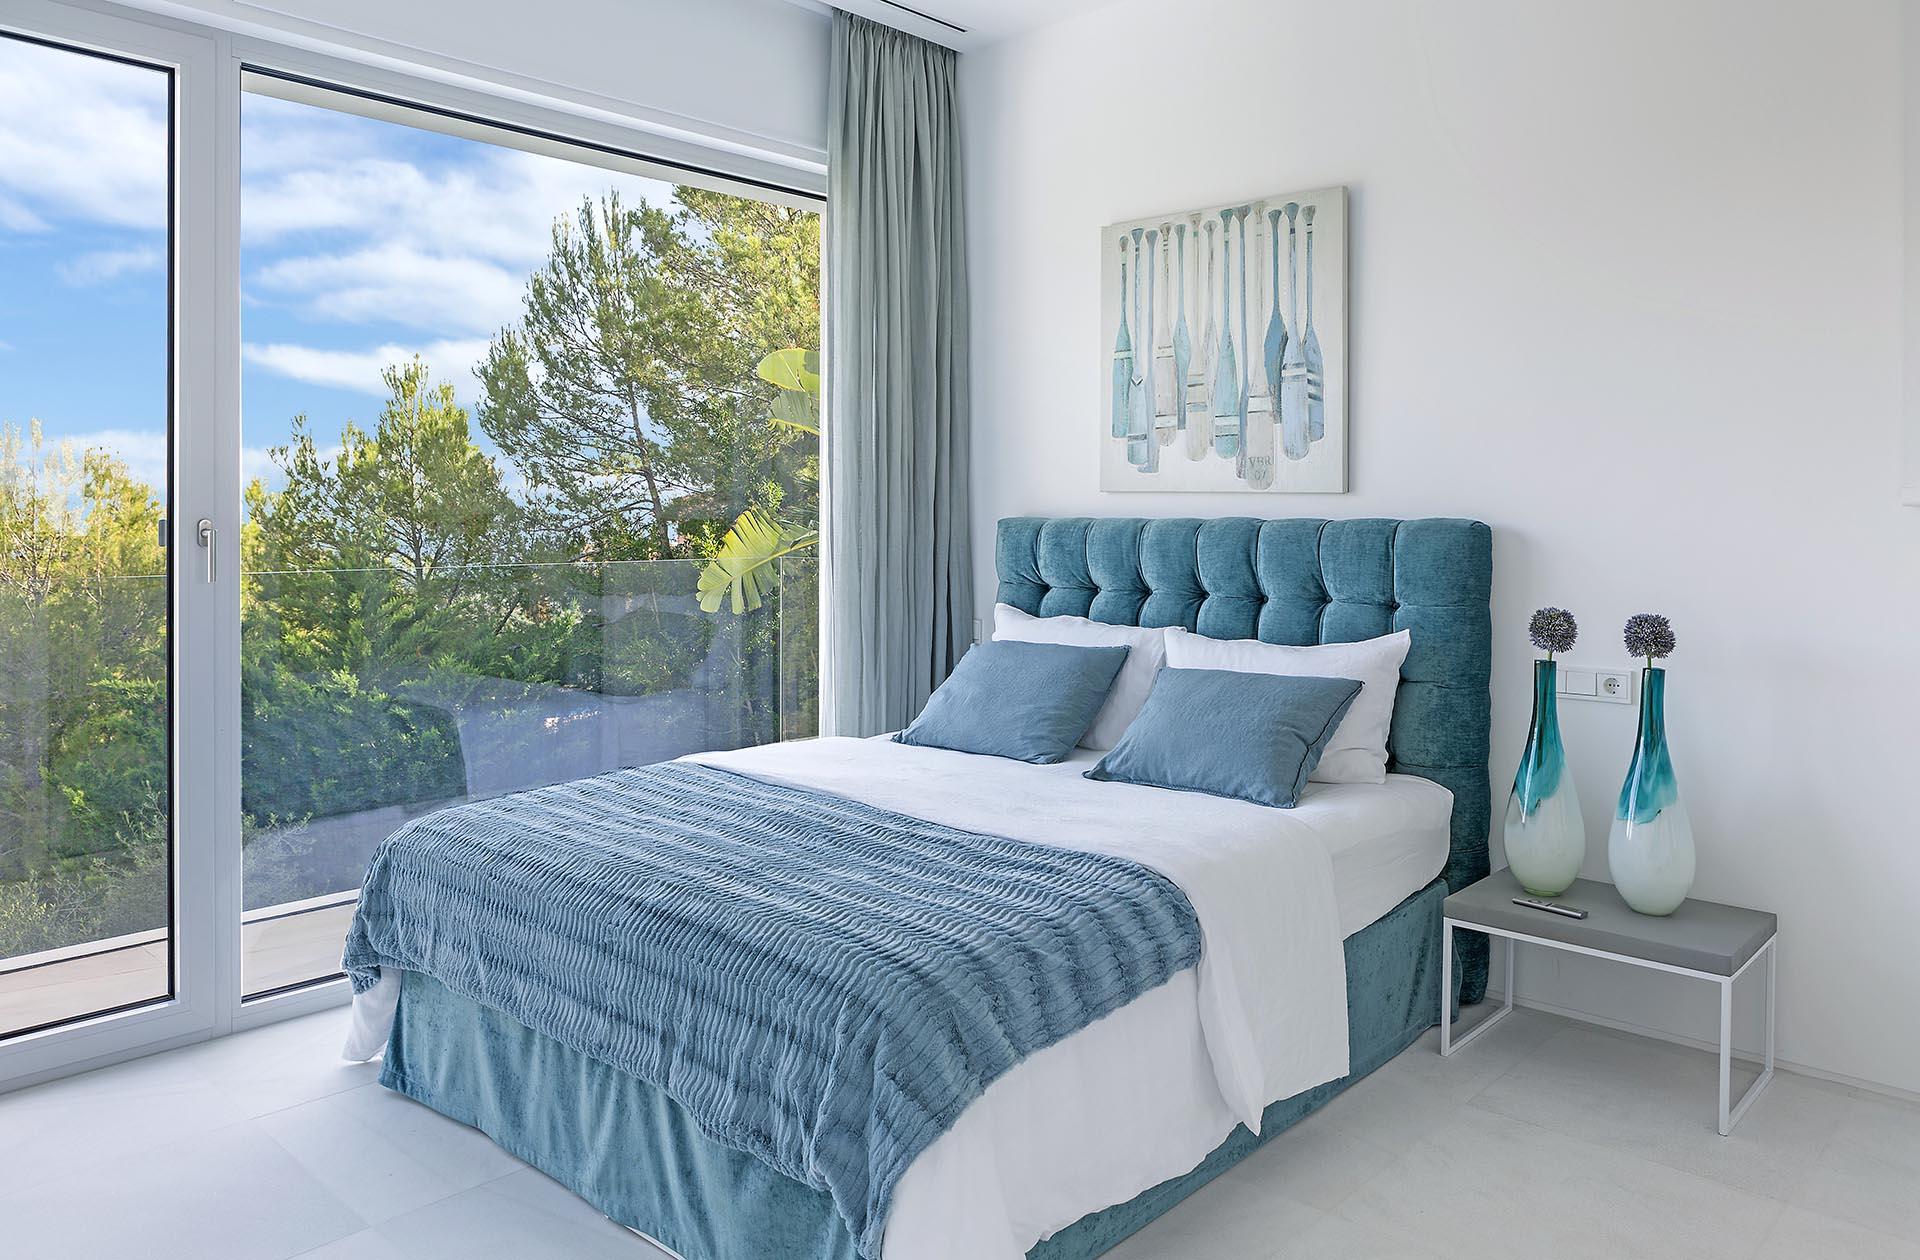 Beautiful modern villa in Costa den Blanes - Niceambience